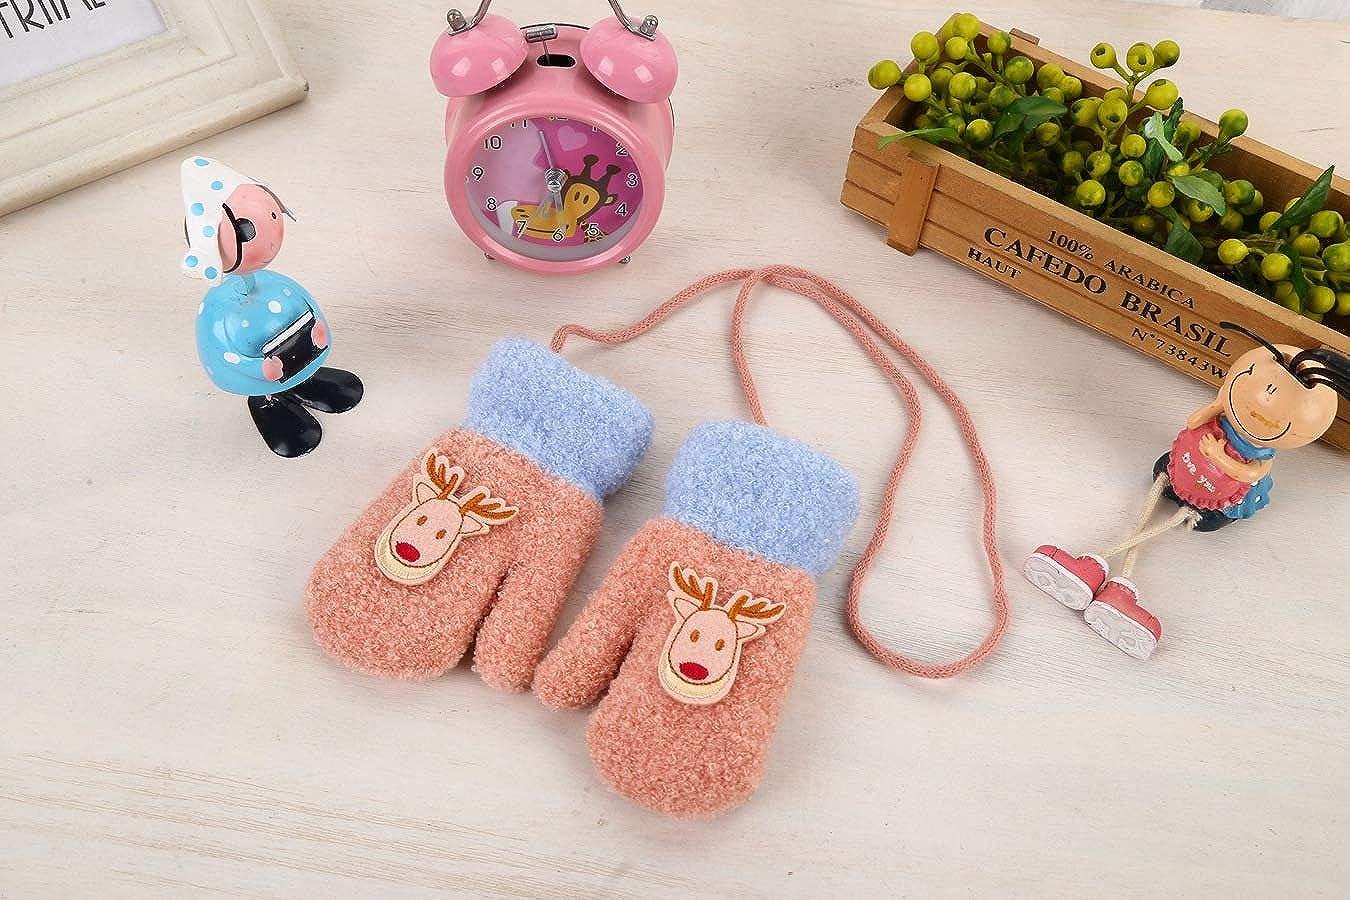 Baby Mitten Cartoon Winter Gloves Toddler Girls Boys Knitted Gloves Cute Mitten Full Finger Wrist Gloves with String Hang Neck